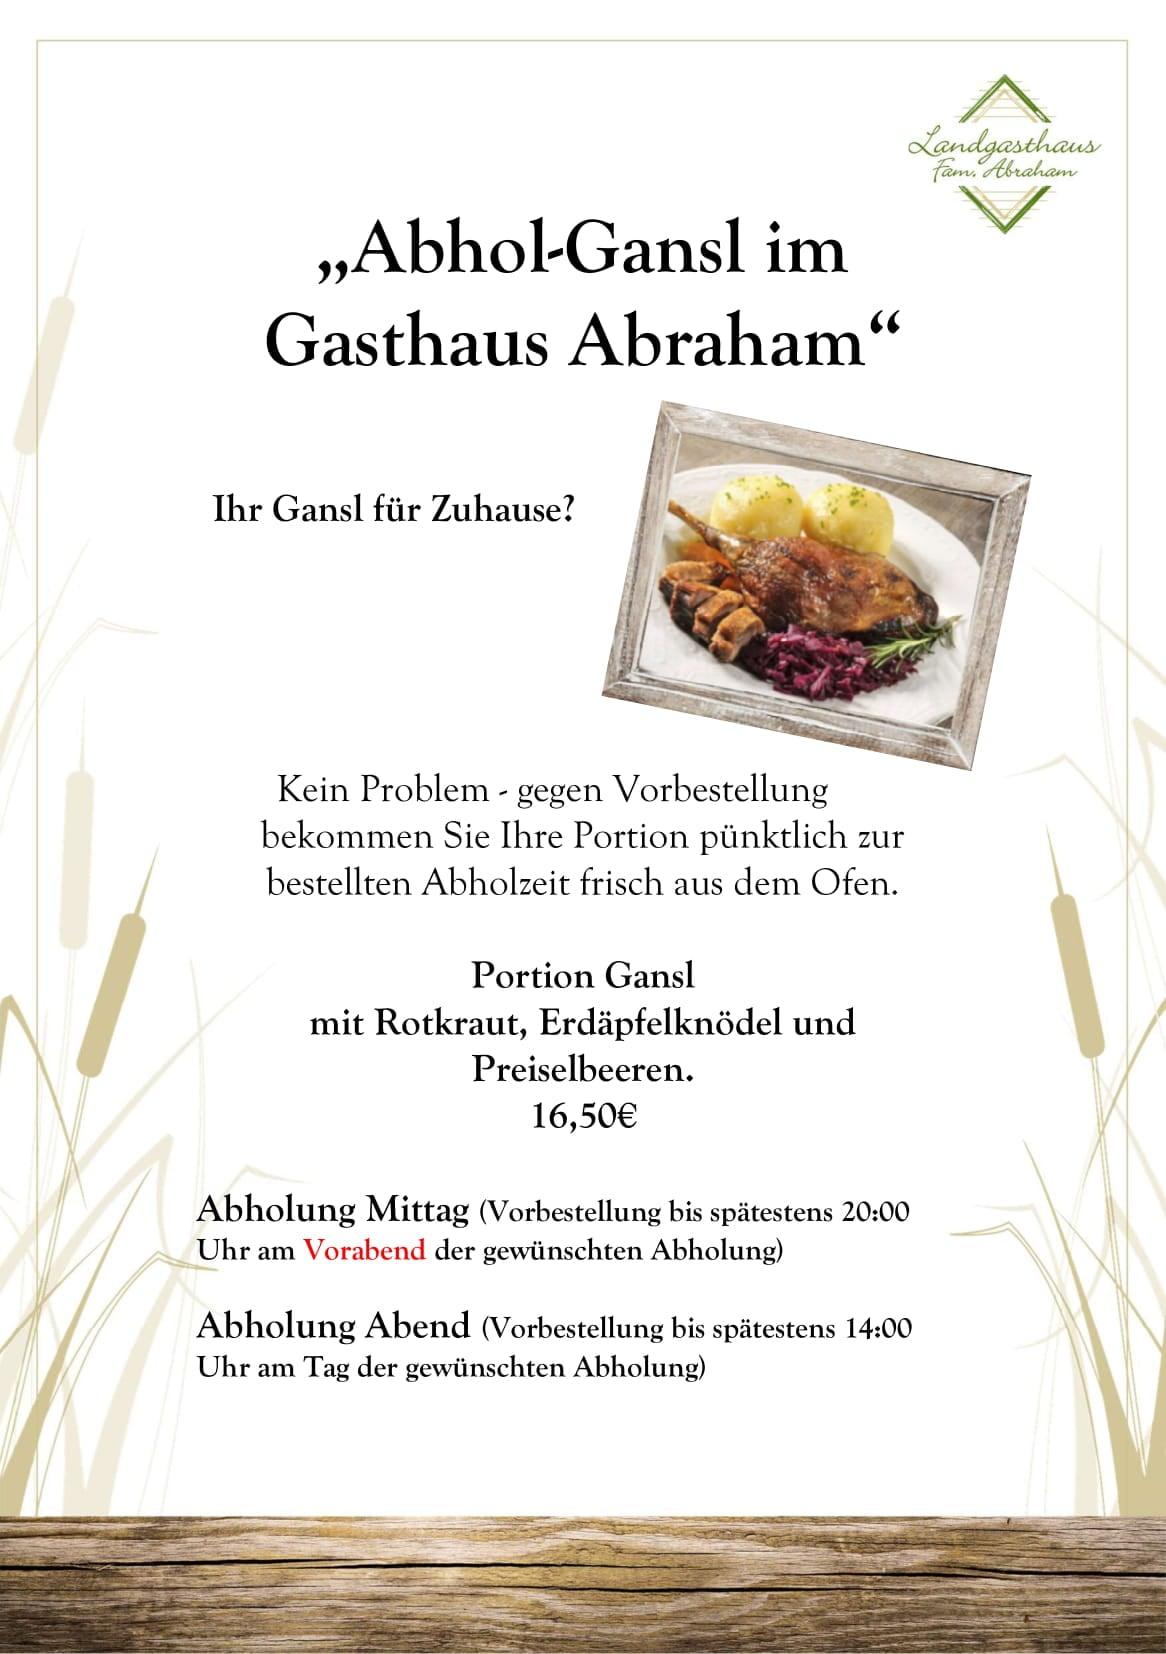 Gasthaus Abraham